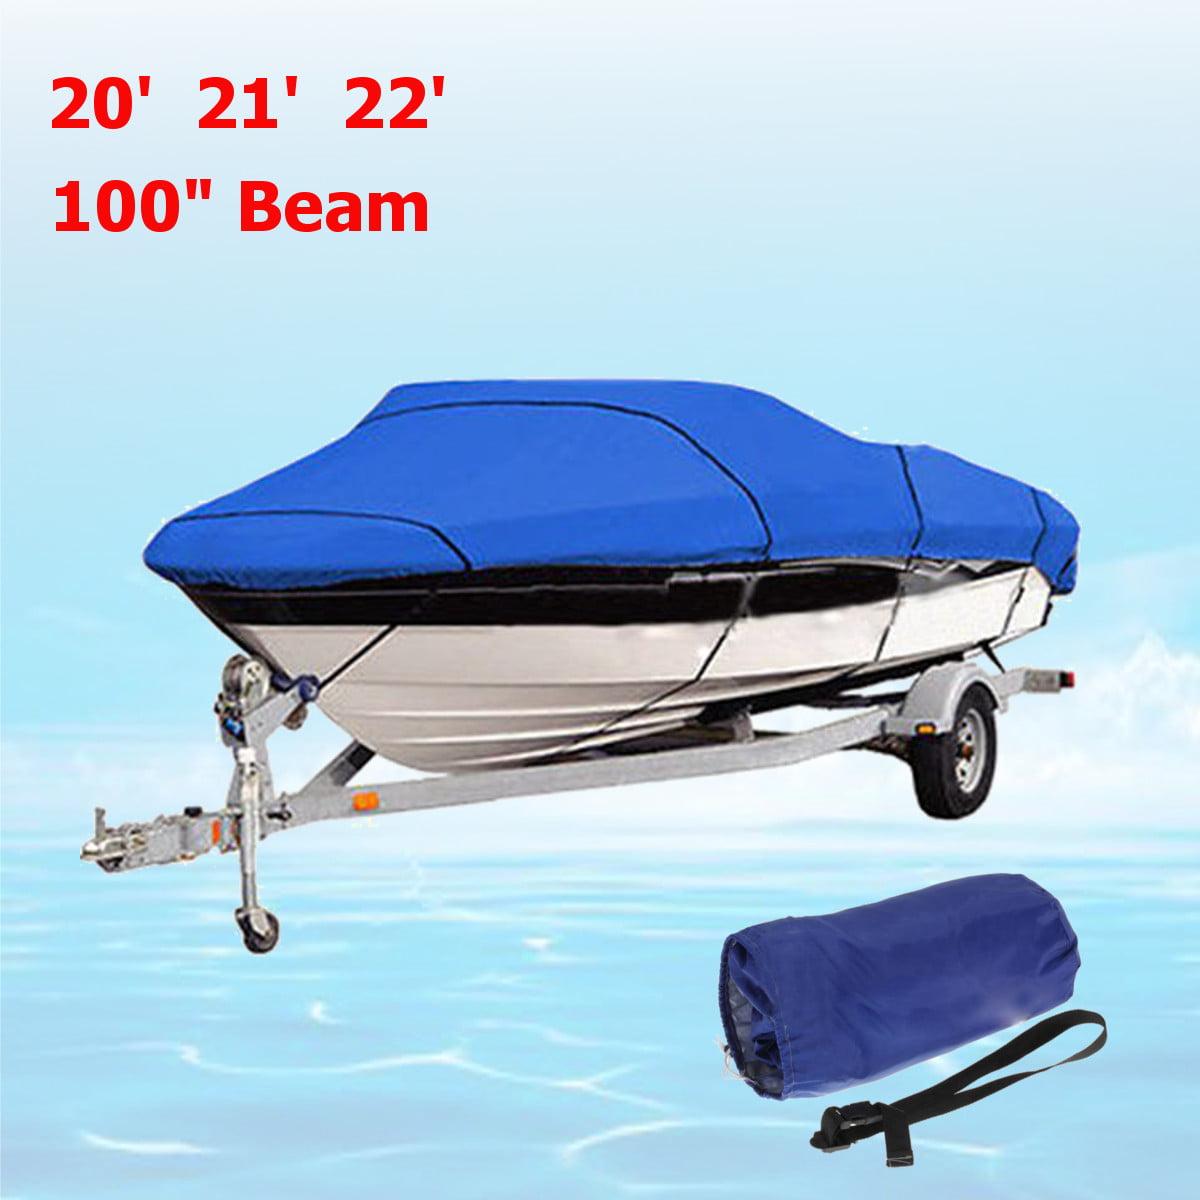 20 Feet 21 Feet 22 Feet 100 Beam Waterproof Dustproof Boat Cover Heavy Duty For Fish-Ski V-Hull Speedboat 210D Bag by